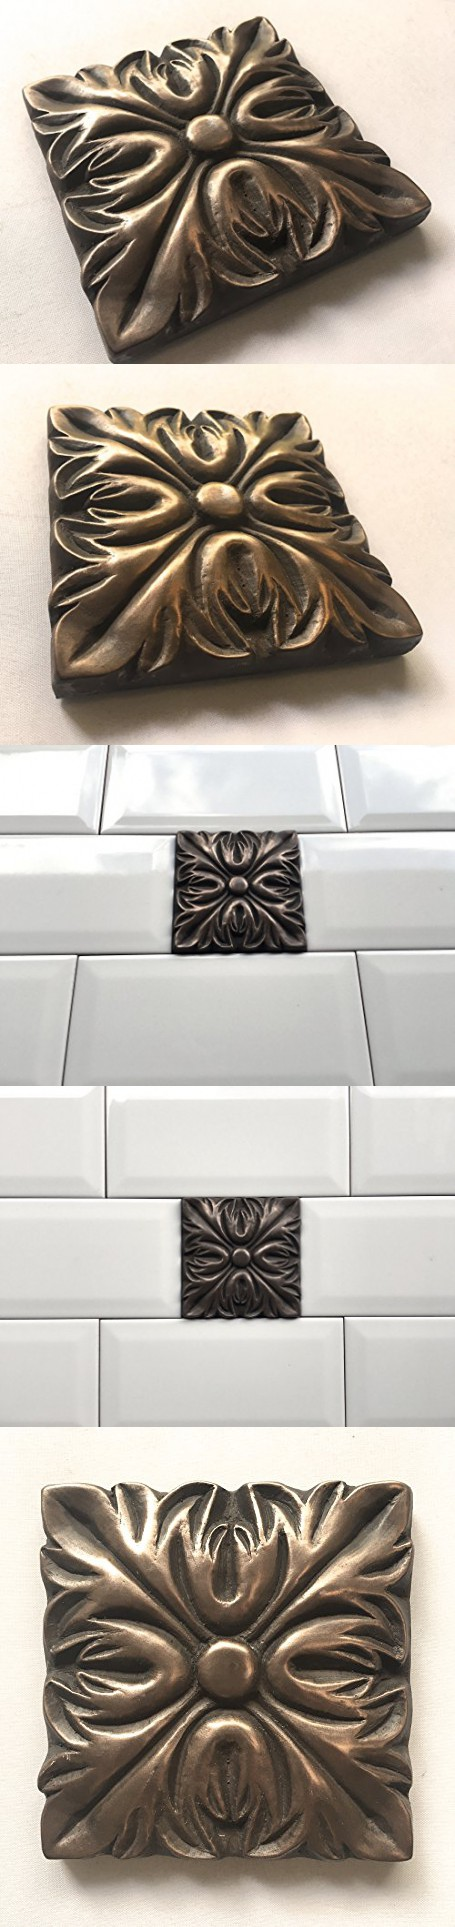 Decorative Tile Accent Pieces Bronze Metallic 4X4 Resin Decorative Insert Accent Piece Tile